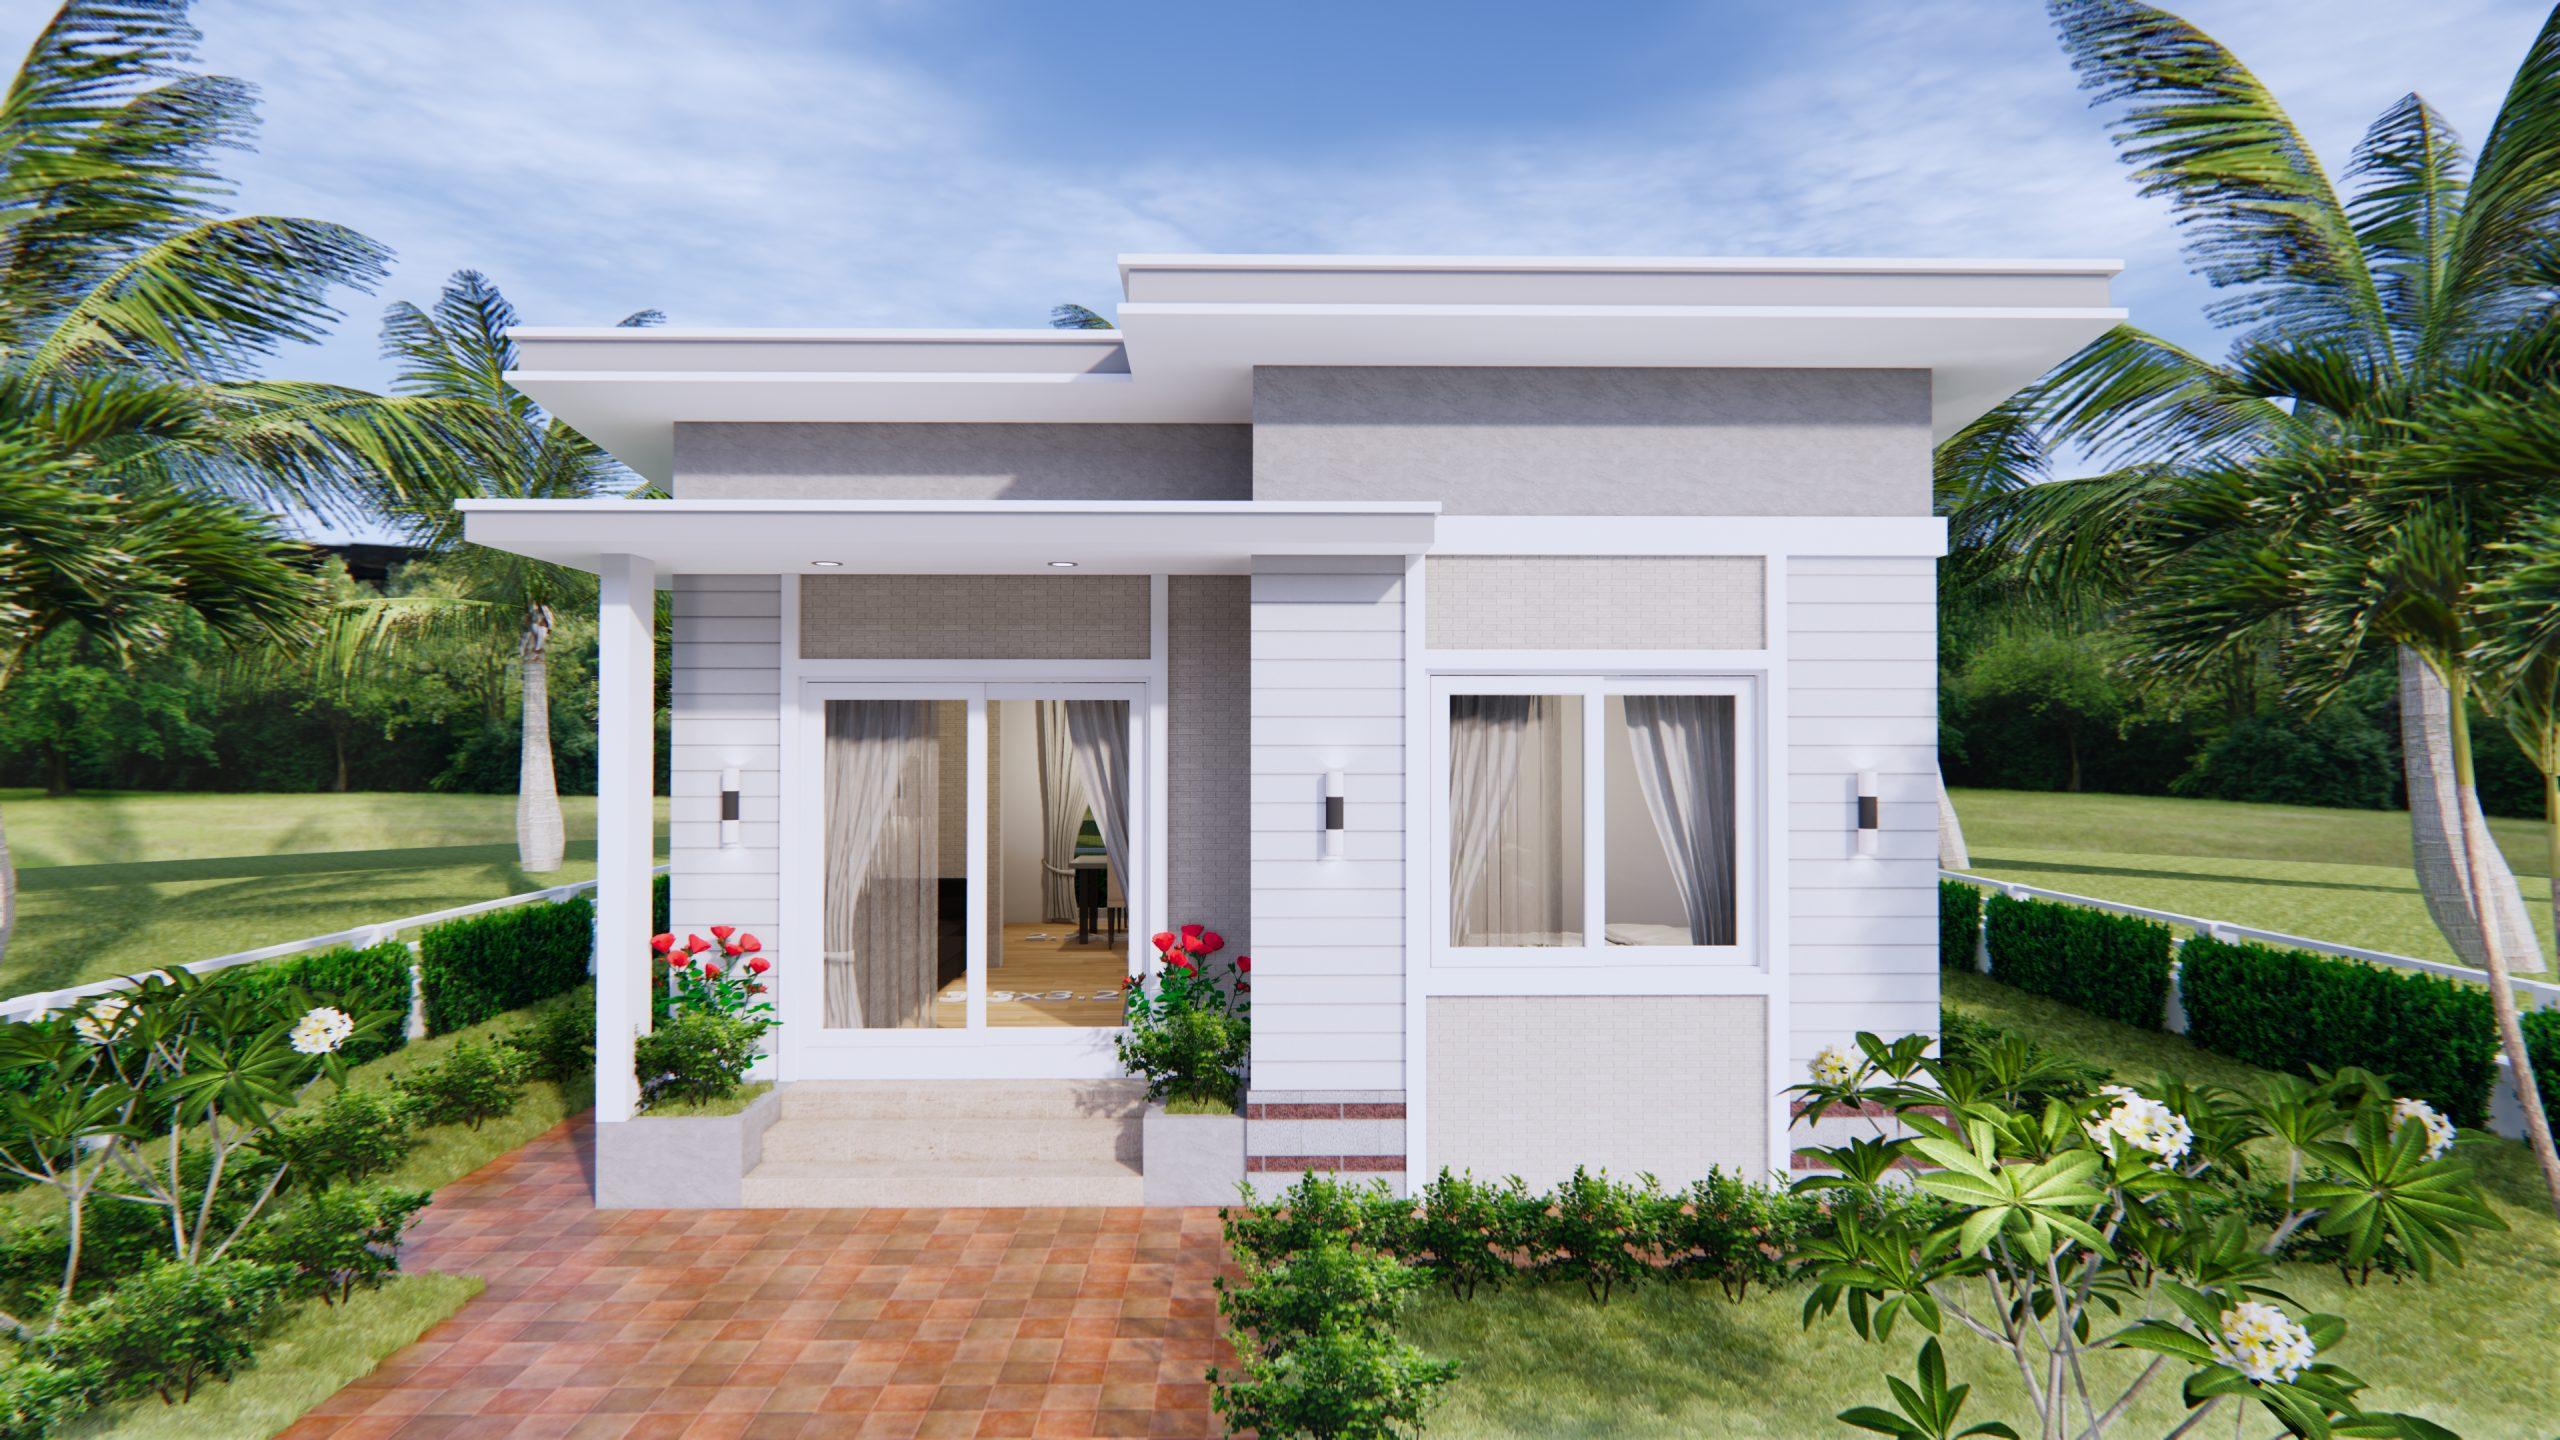 Modern Tiny Homes 7x7 Meters 24x24 Feet 2